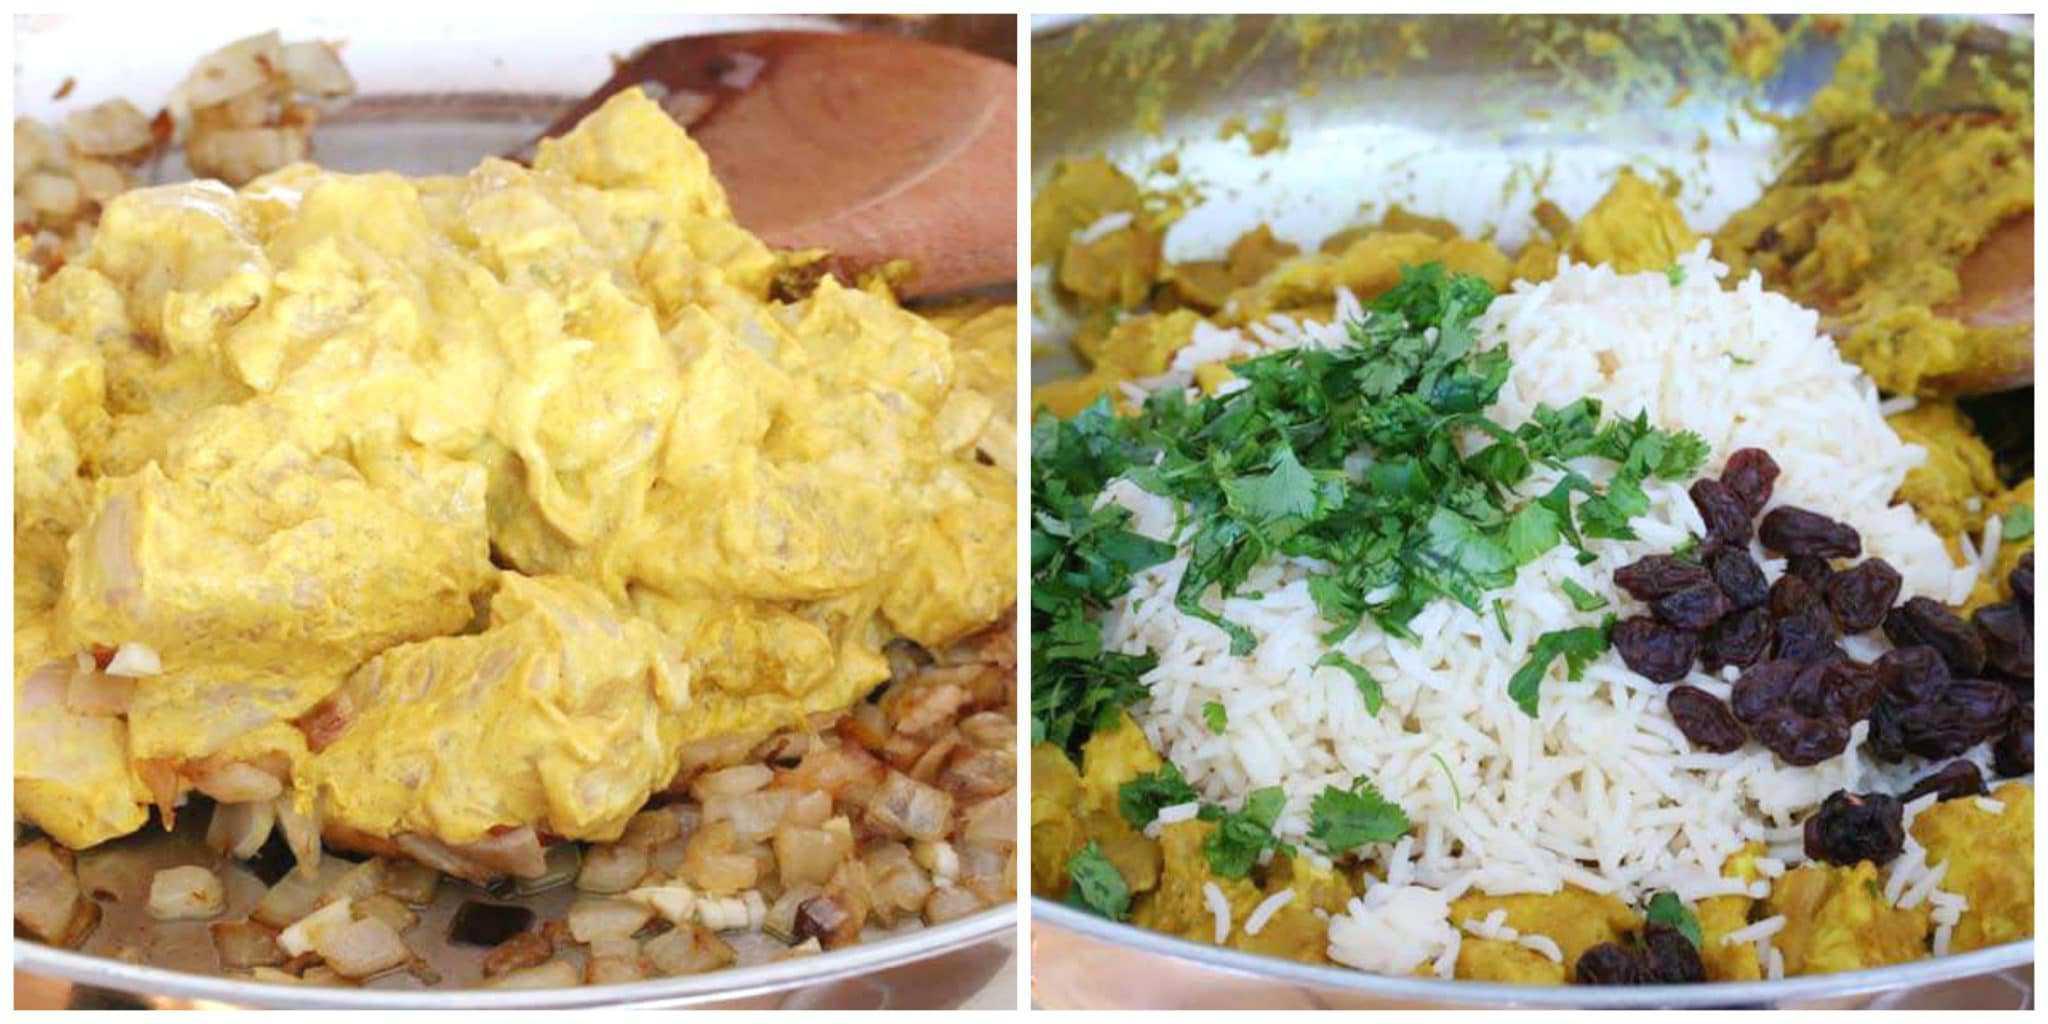 chicken biryani recipe easy Indian fast curry raisins almonds rice basmati